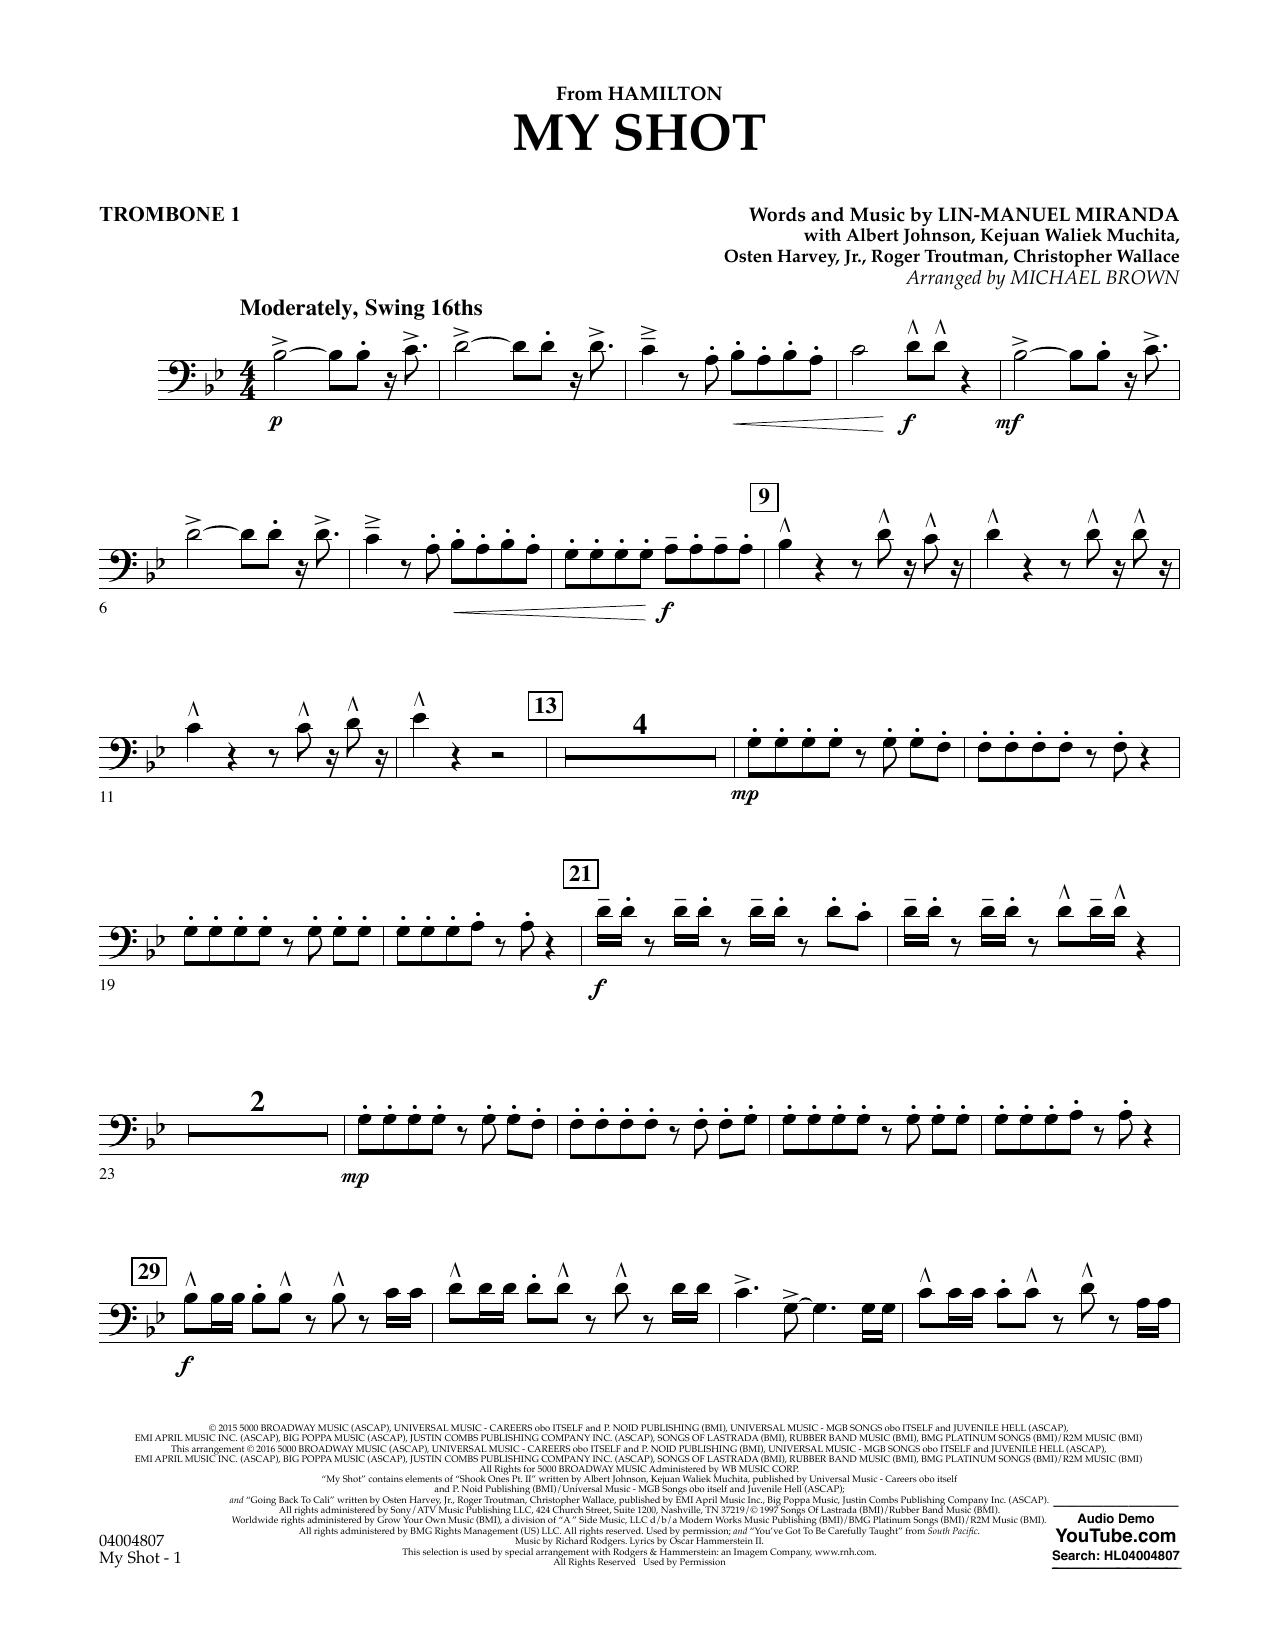 My Shot (from Hamilton) - Trombone 1 Sheet Music